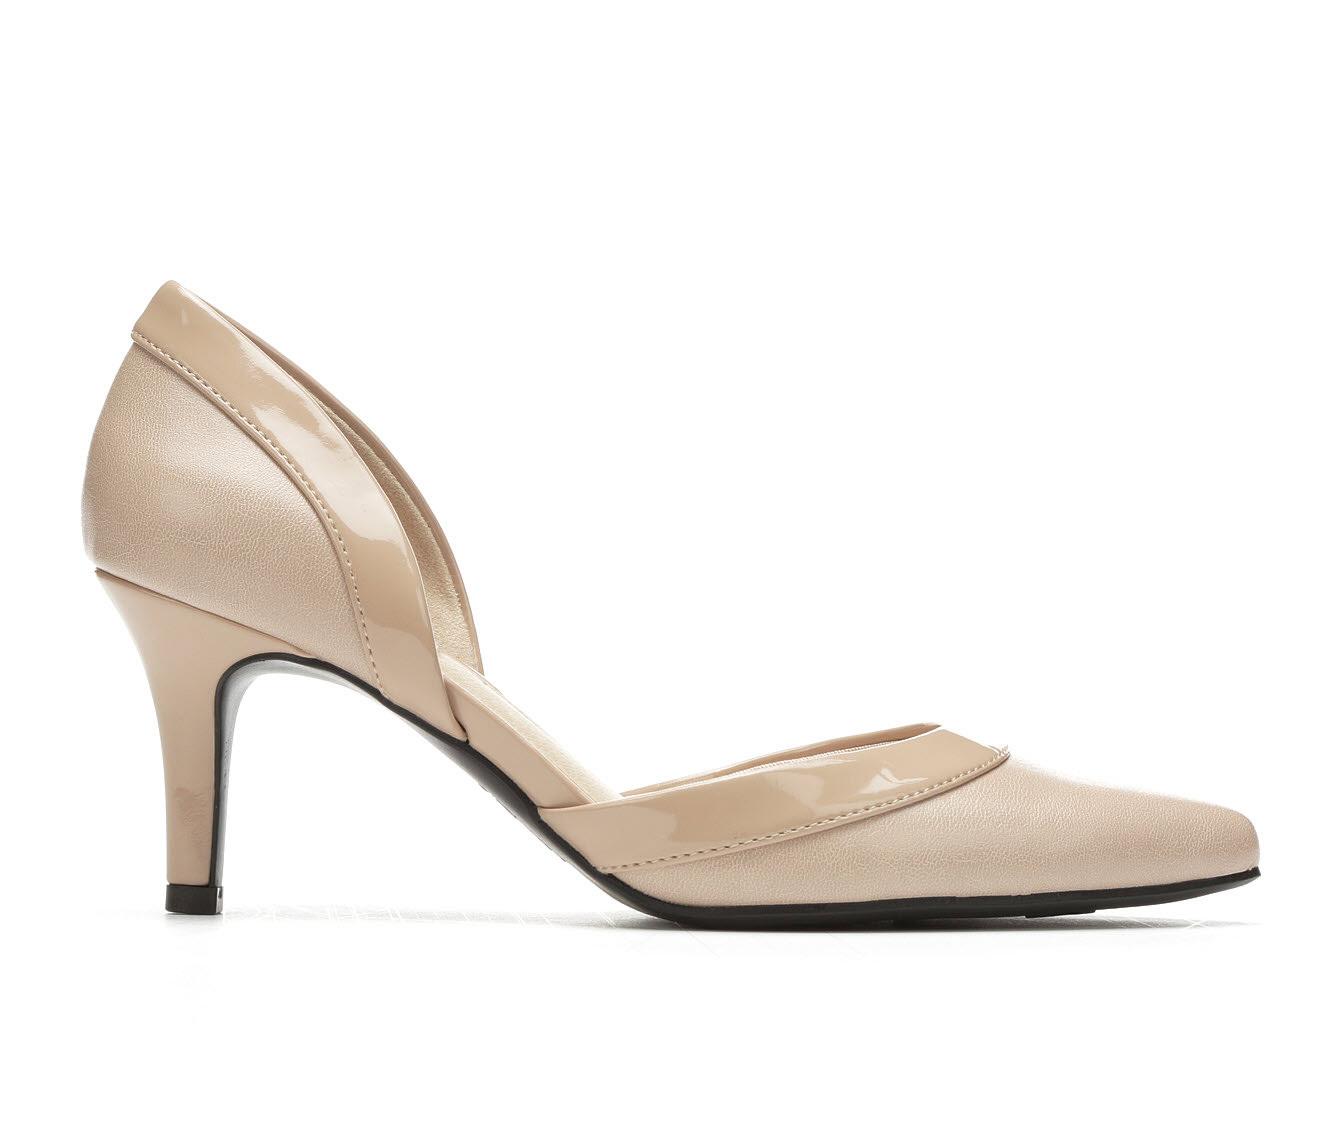 LifeStride Saldana Women's Dress Shoe (Pink Faux Leather)